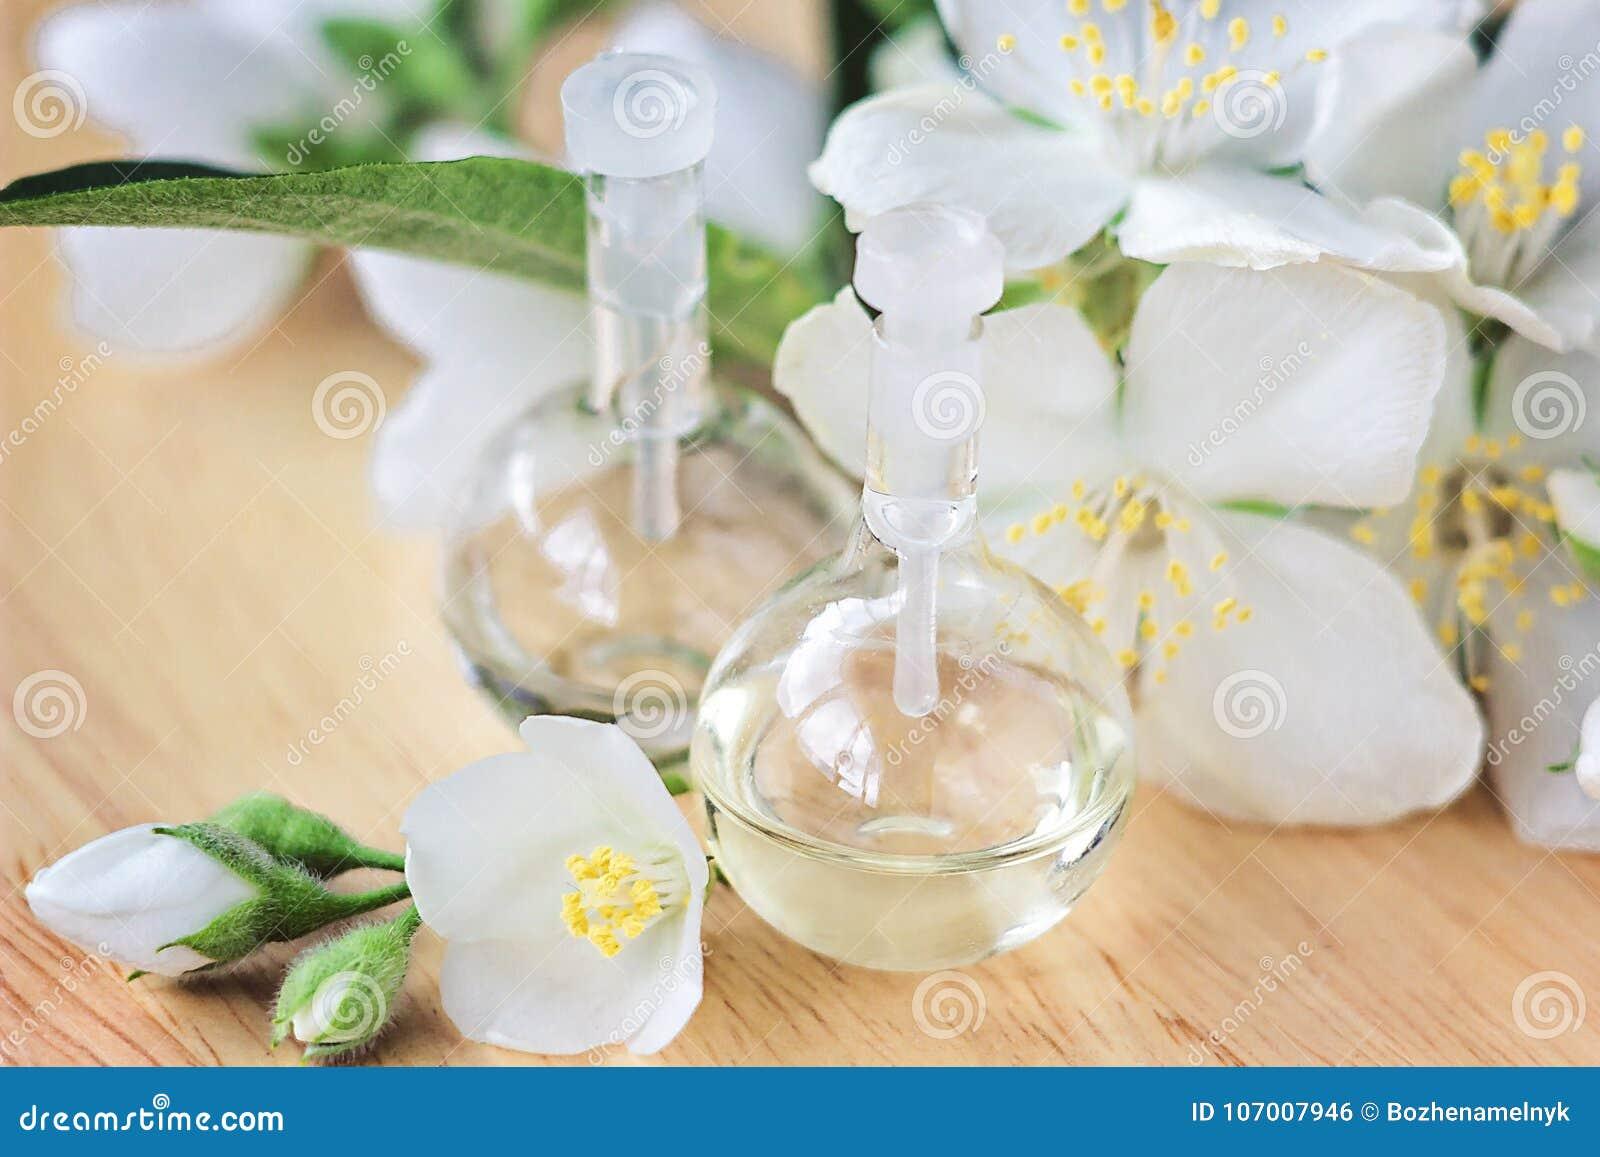 Essential oil in glass bottle with fresh jasmine flowers beauty royalty free stock photo izmirmasajfo